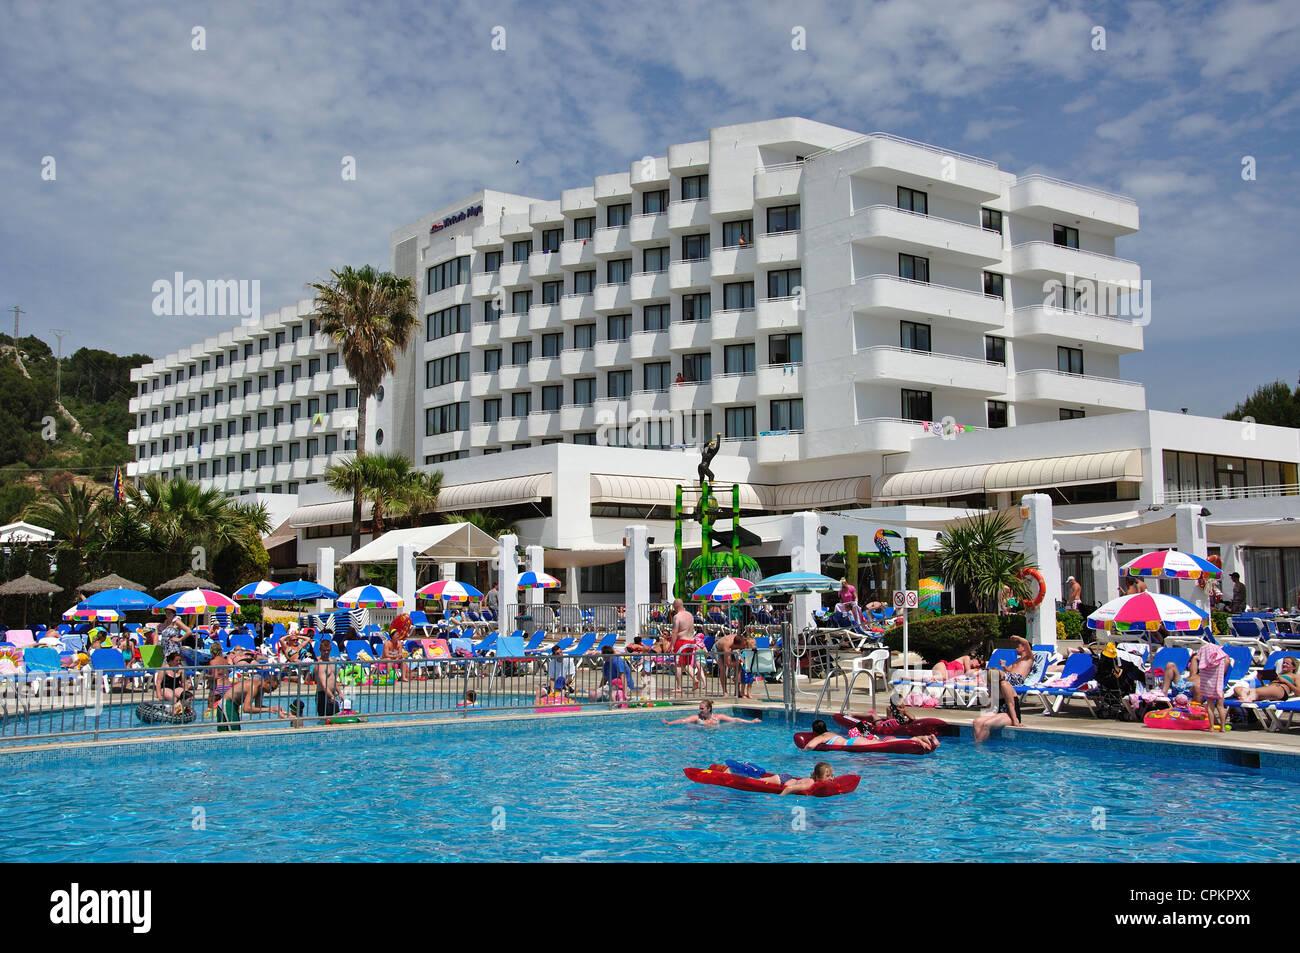 Crowded swimming pool at hotel victoria playa sant tom s - Least crowded swimming pool singapore ...